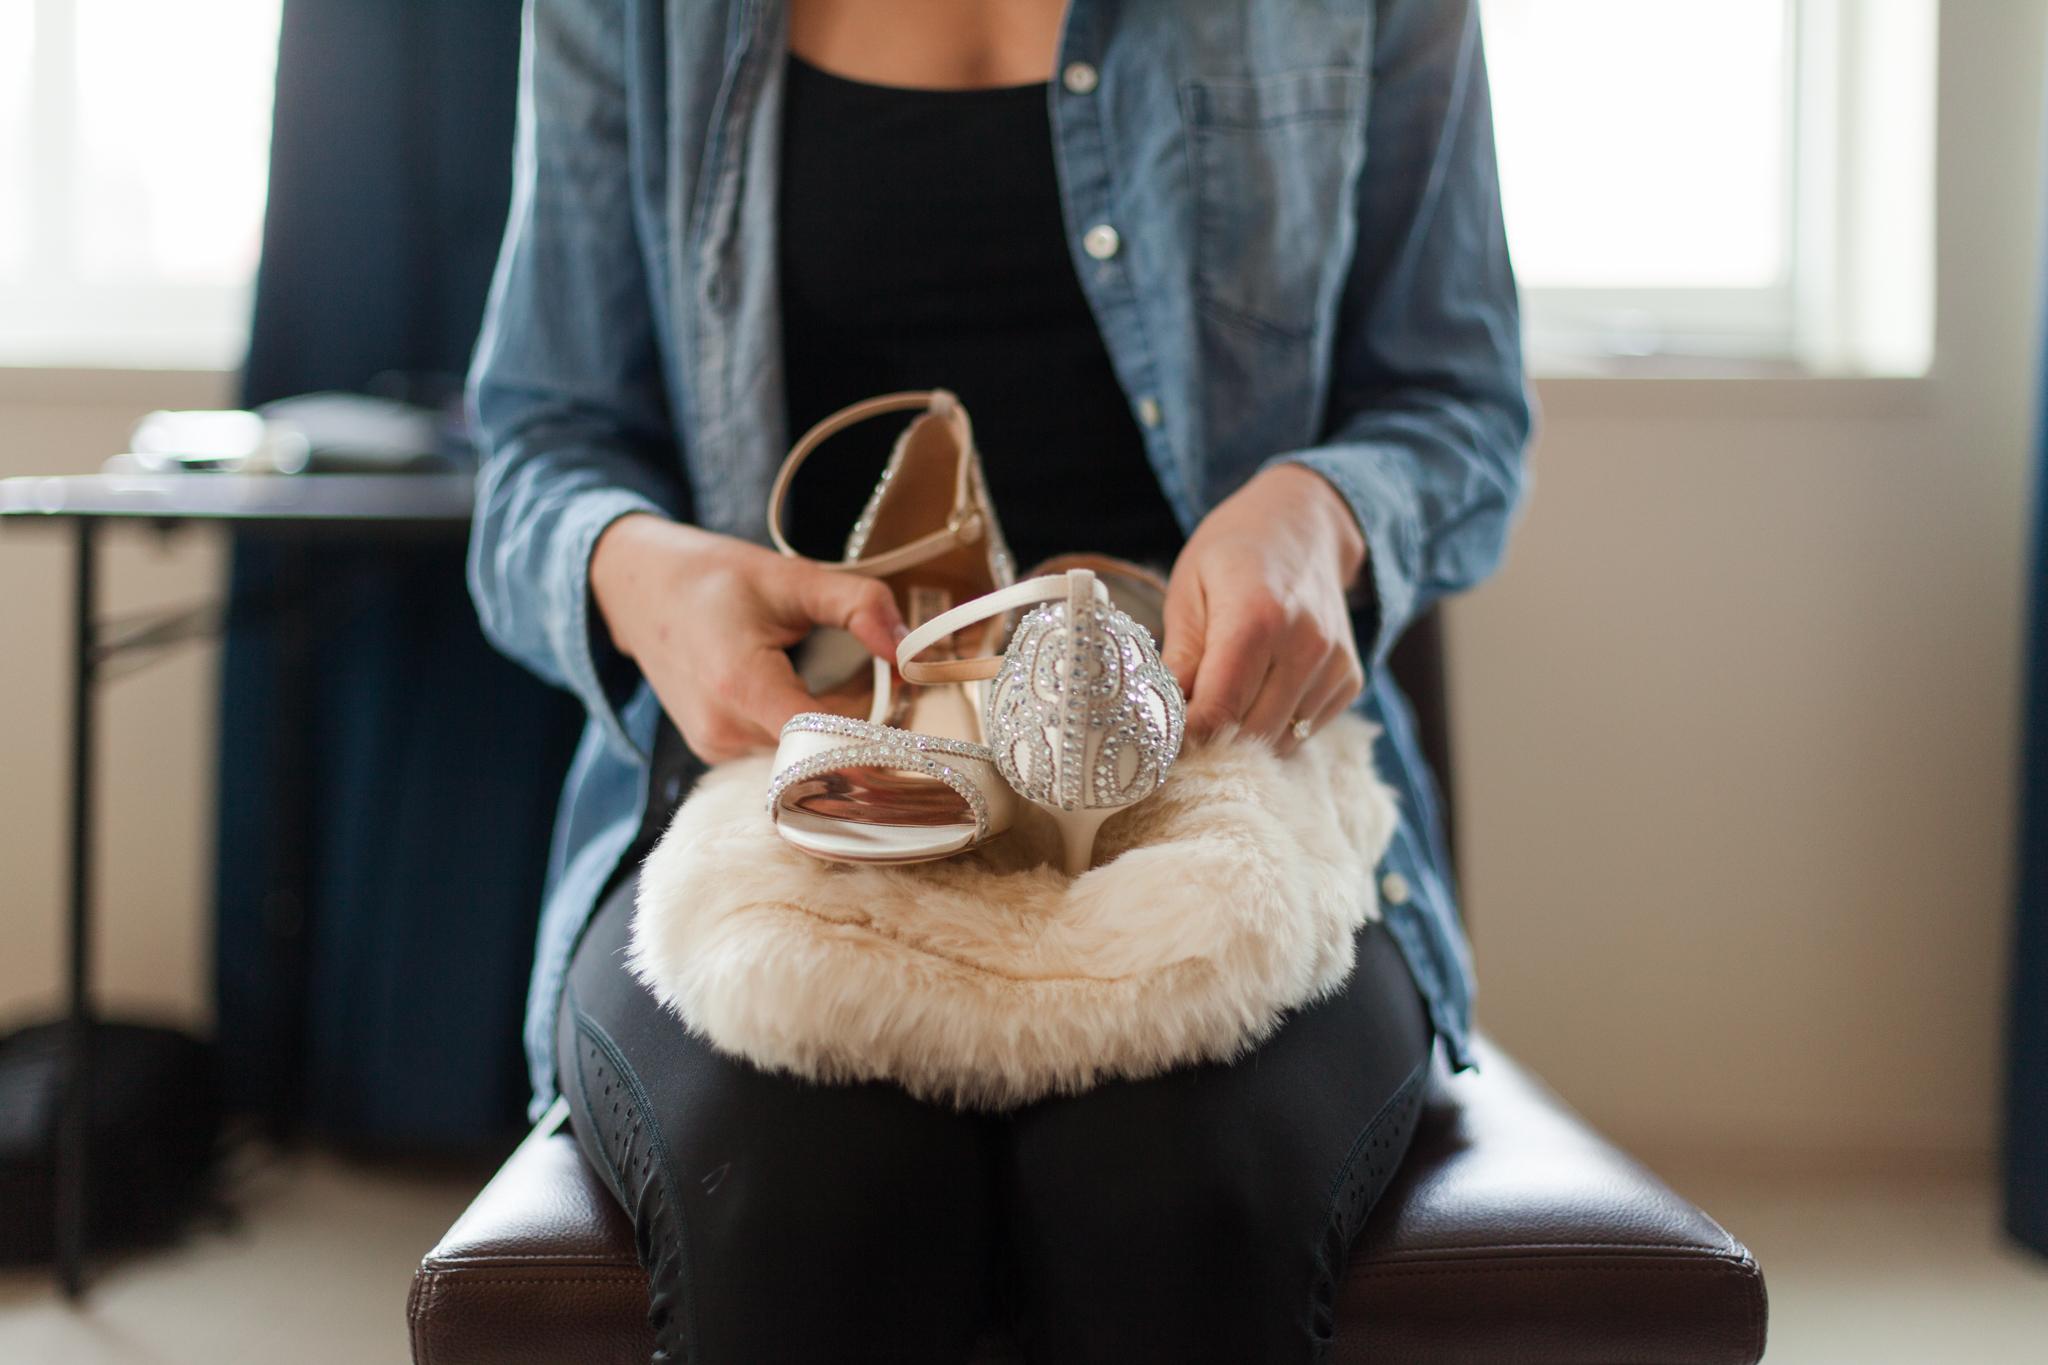 Badgley Mischka heels with fur wrap and denim top | Jessa Anderson Photography | Sixpence Events & Planning | wedding blog | winter wedding